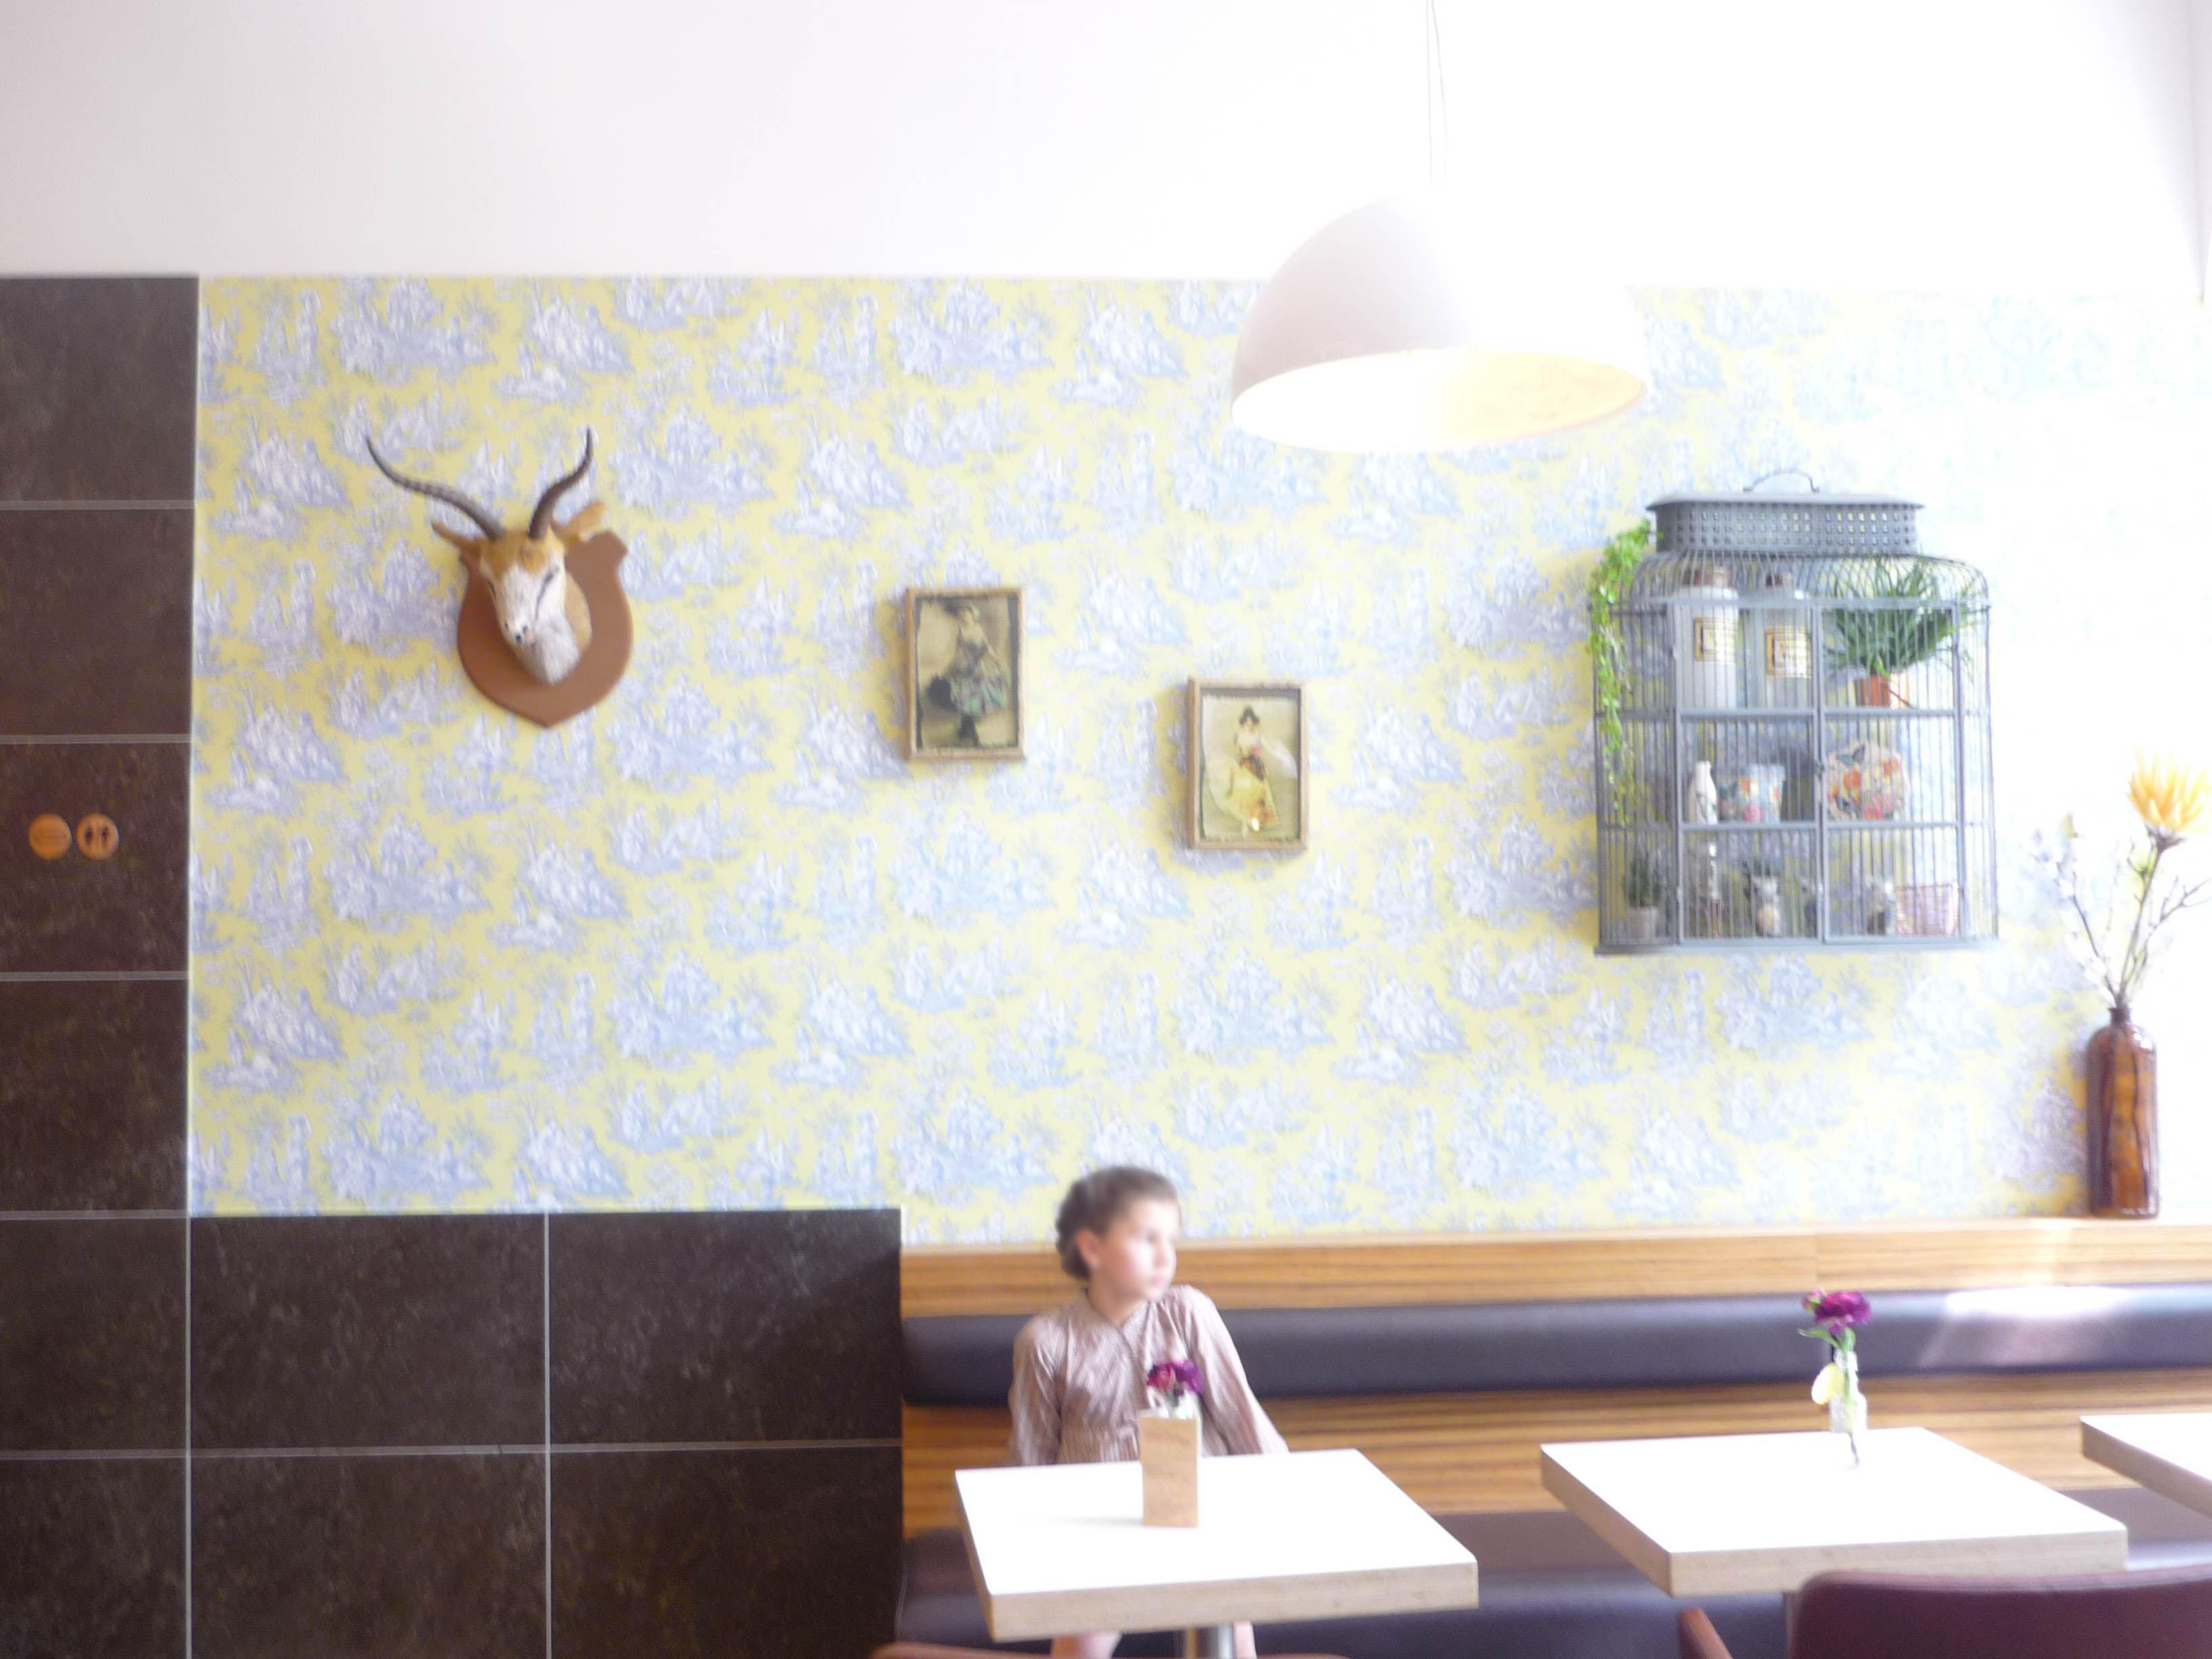 Mädchen im Café - Mathilde MAG